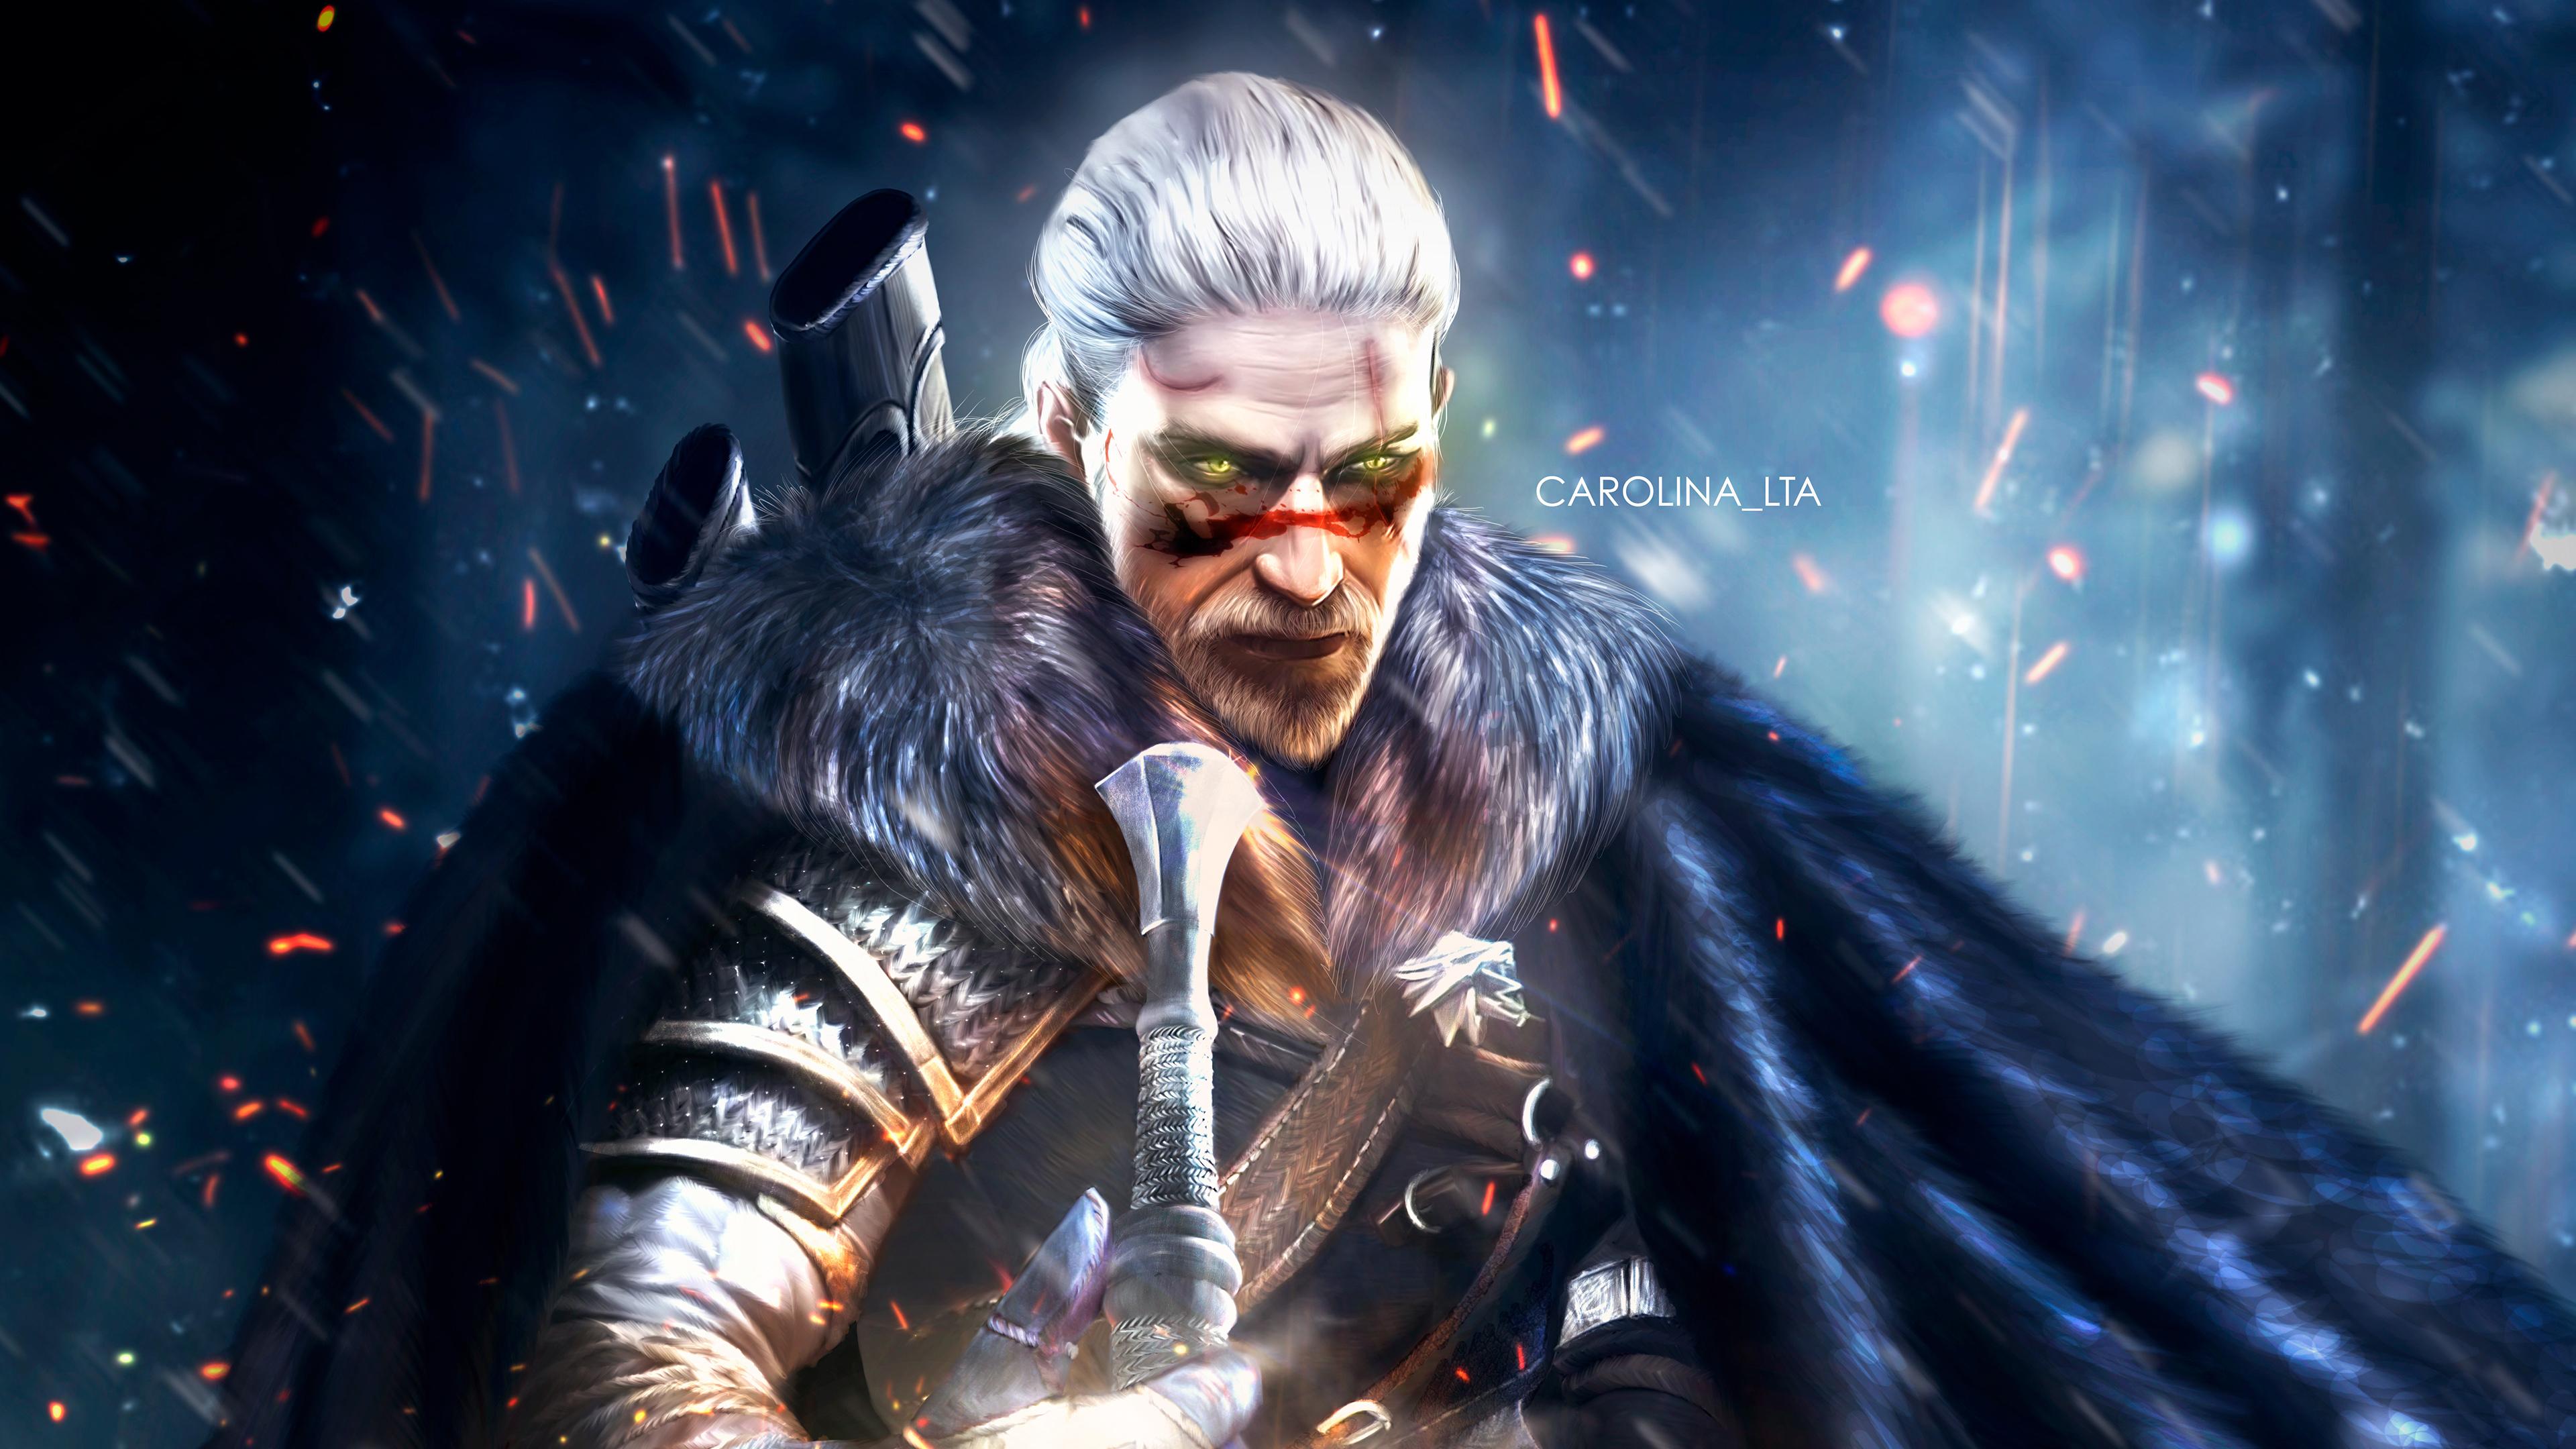 Geralt of rivia 4k hd games 4k wallpapers images - The witcher wallpaper 4k ...